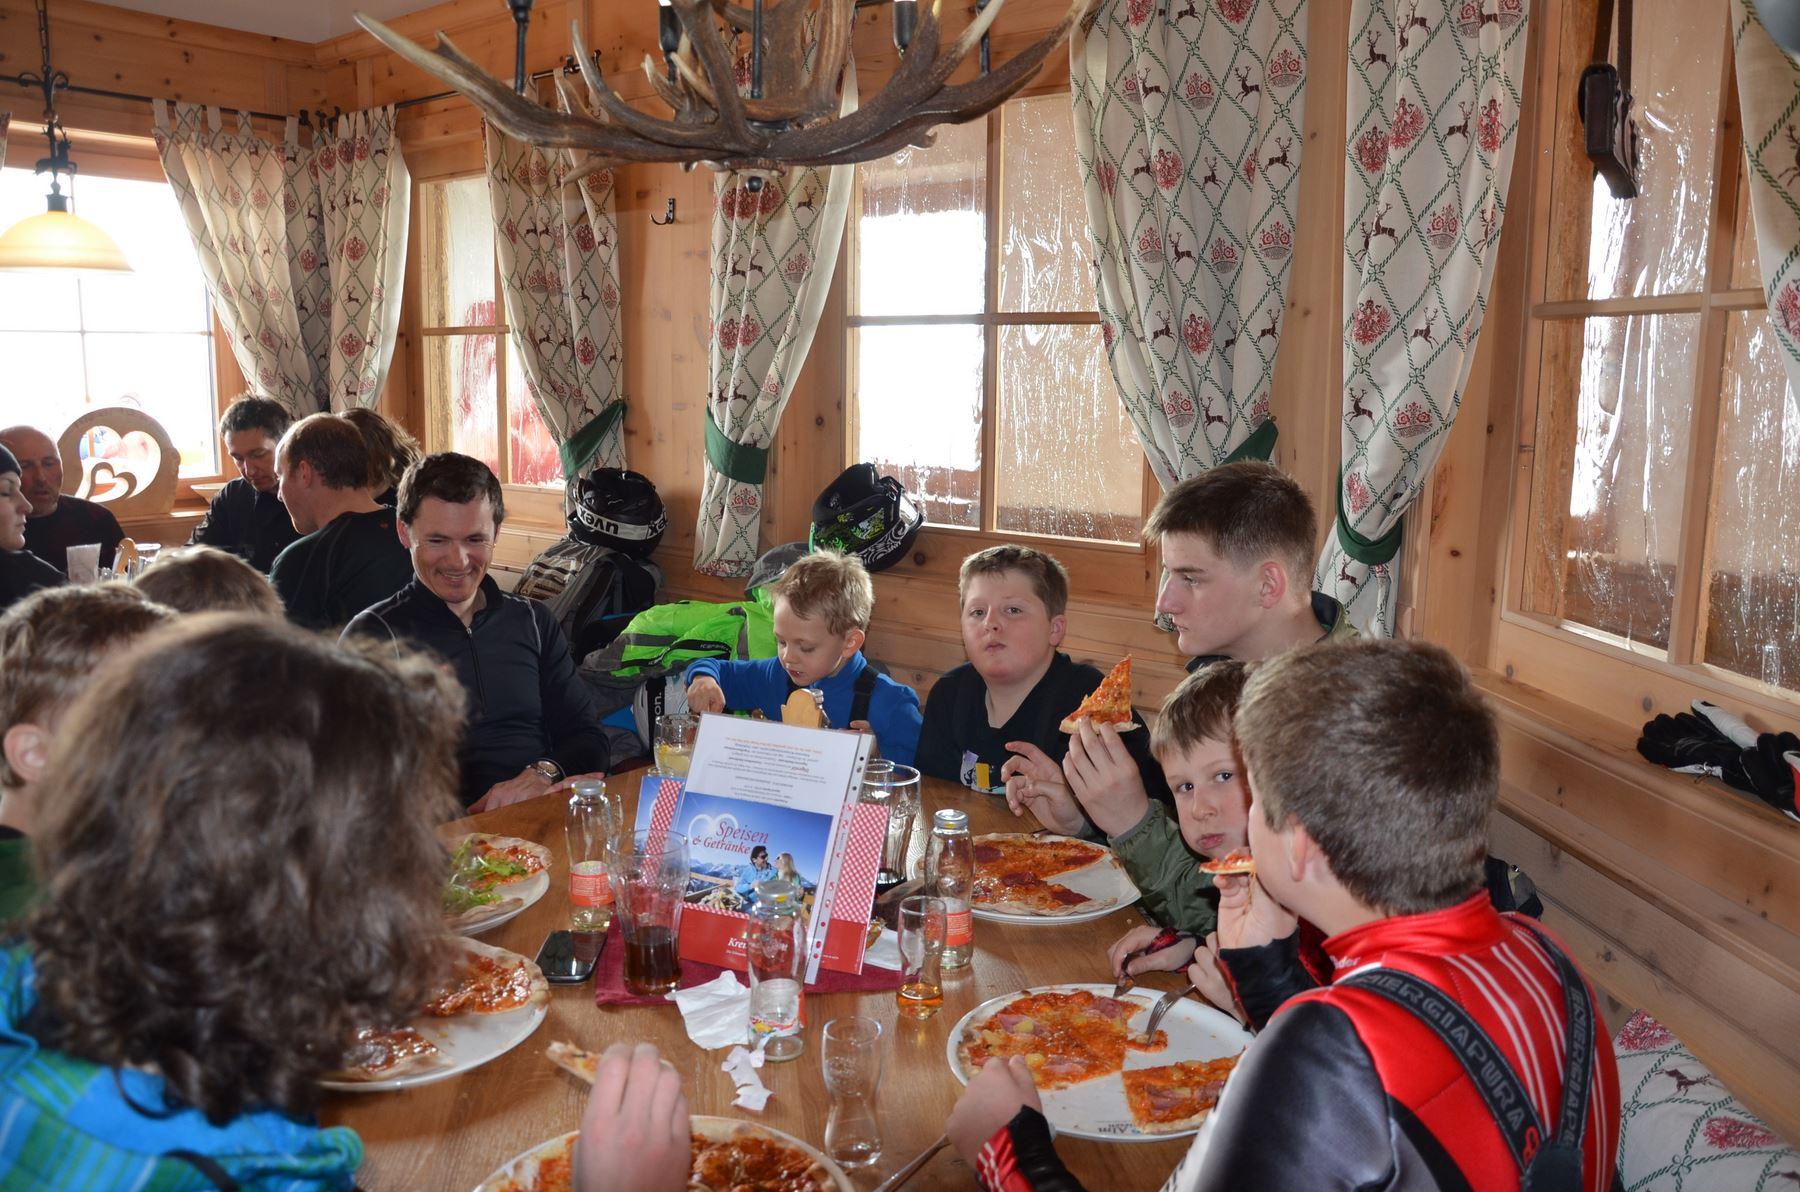 2015-03-22 BV Zillertal Skirennen 306.JPG